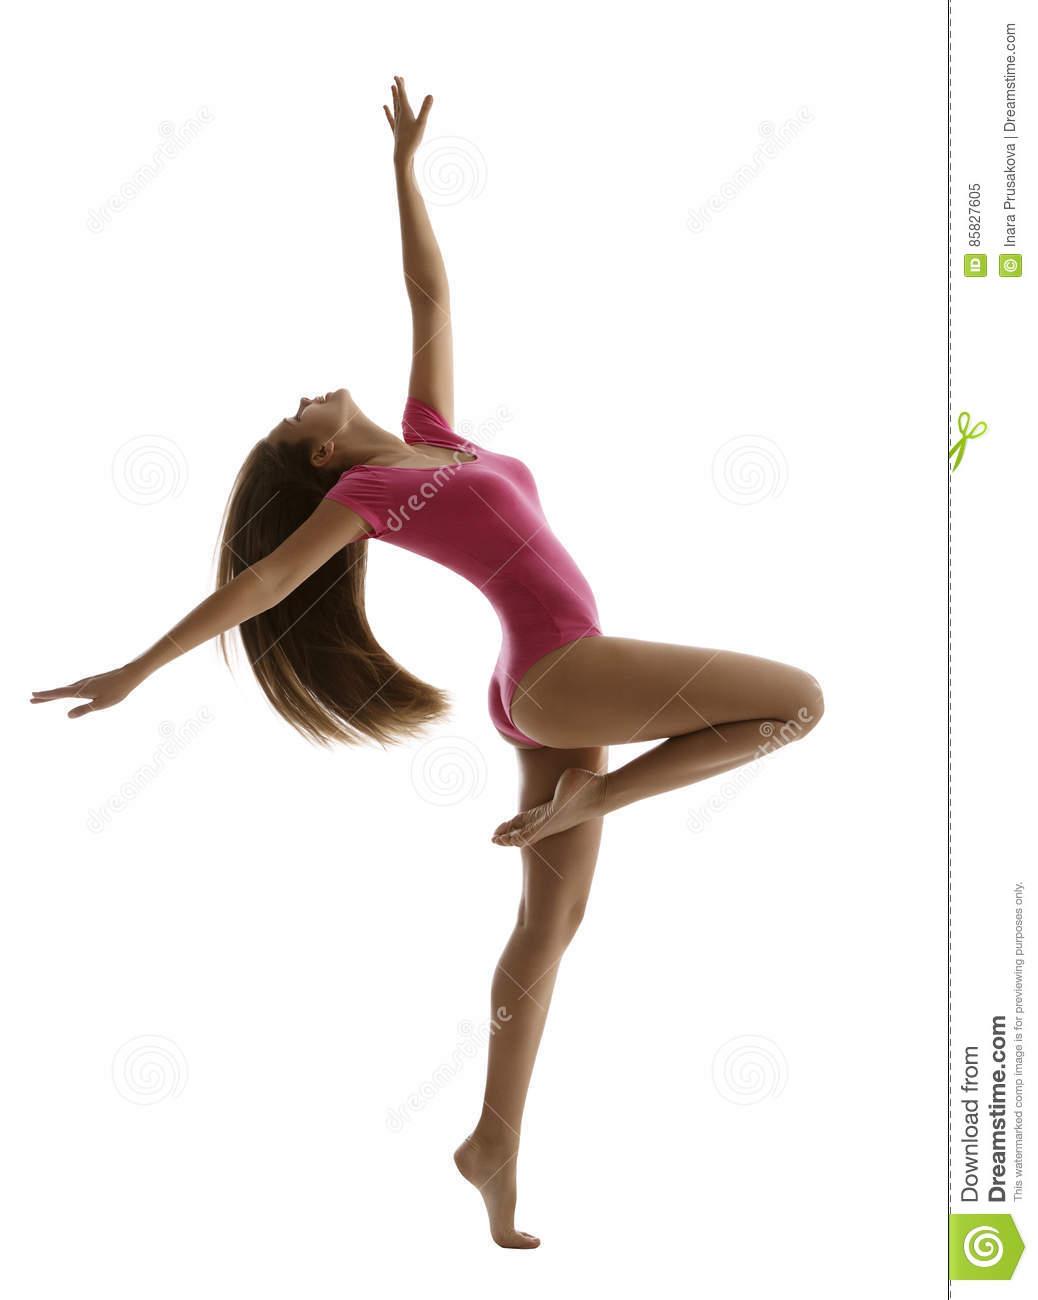 woman sport dancing, girl fitness dancer, young gymnast stock image